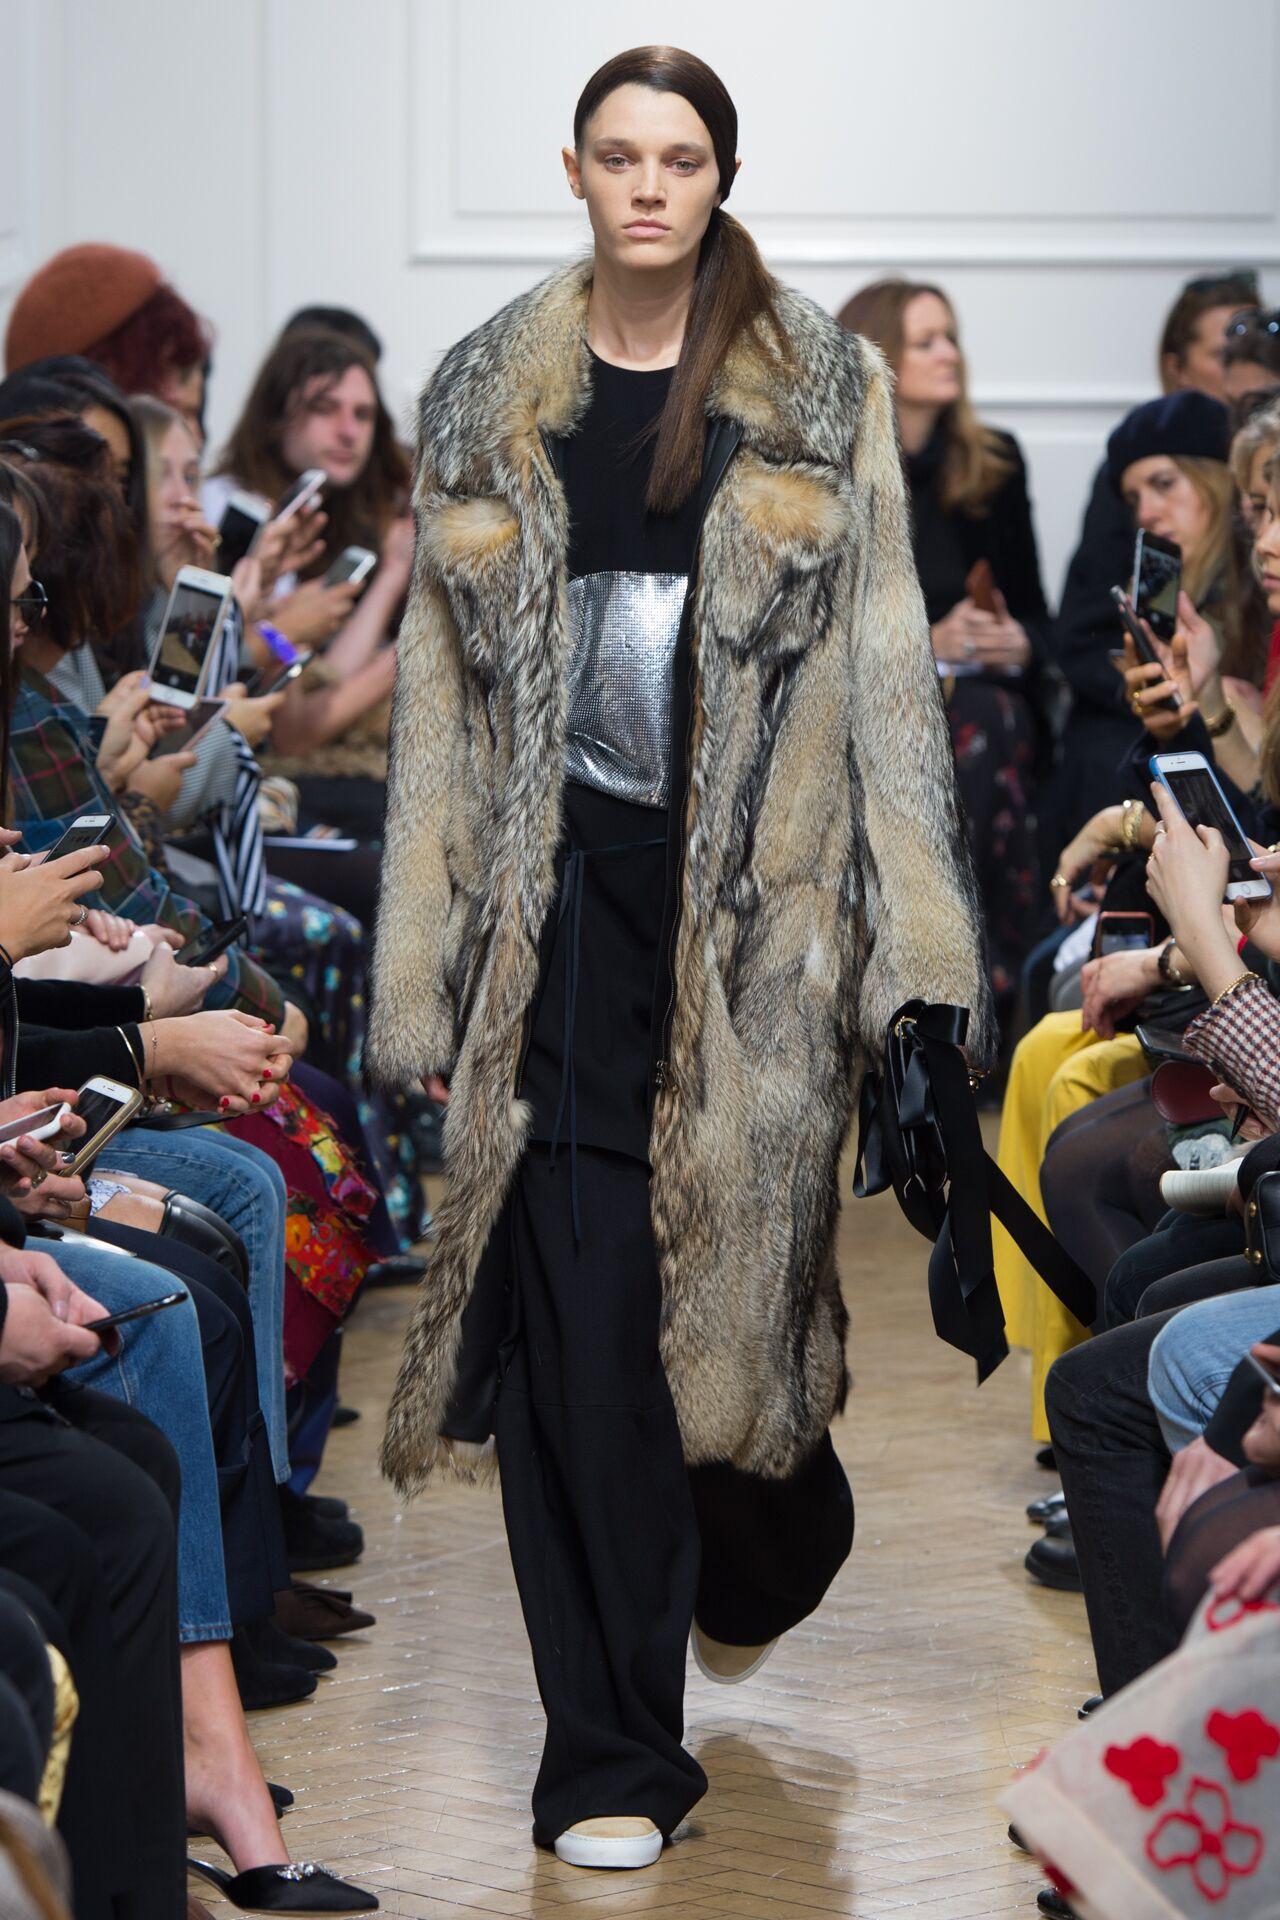 Woman FW 2017-18 Fashion Show J.W. Anderson